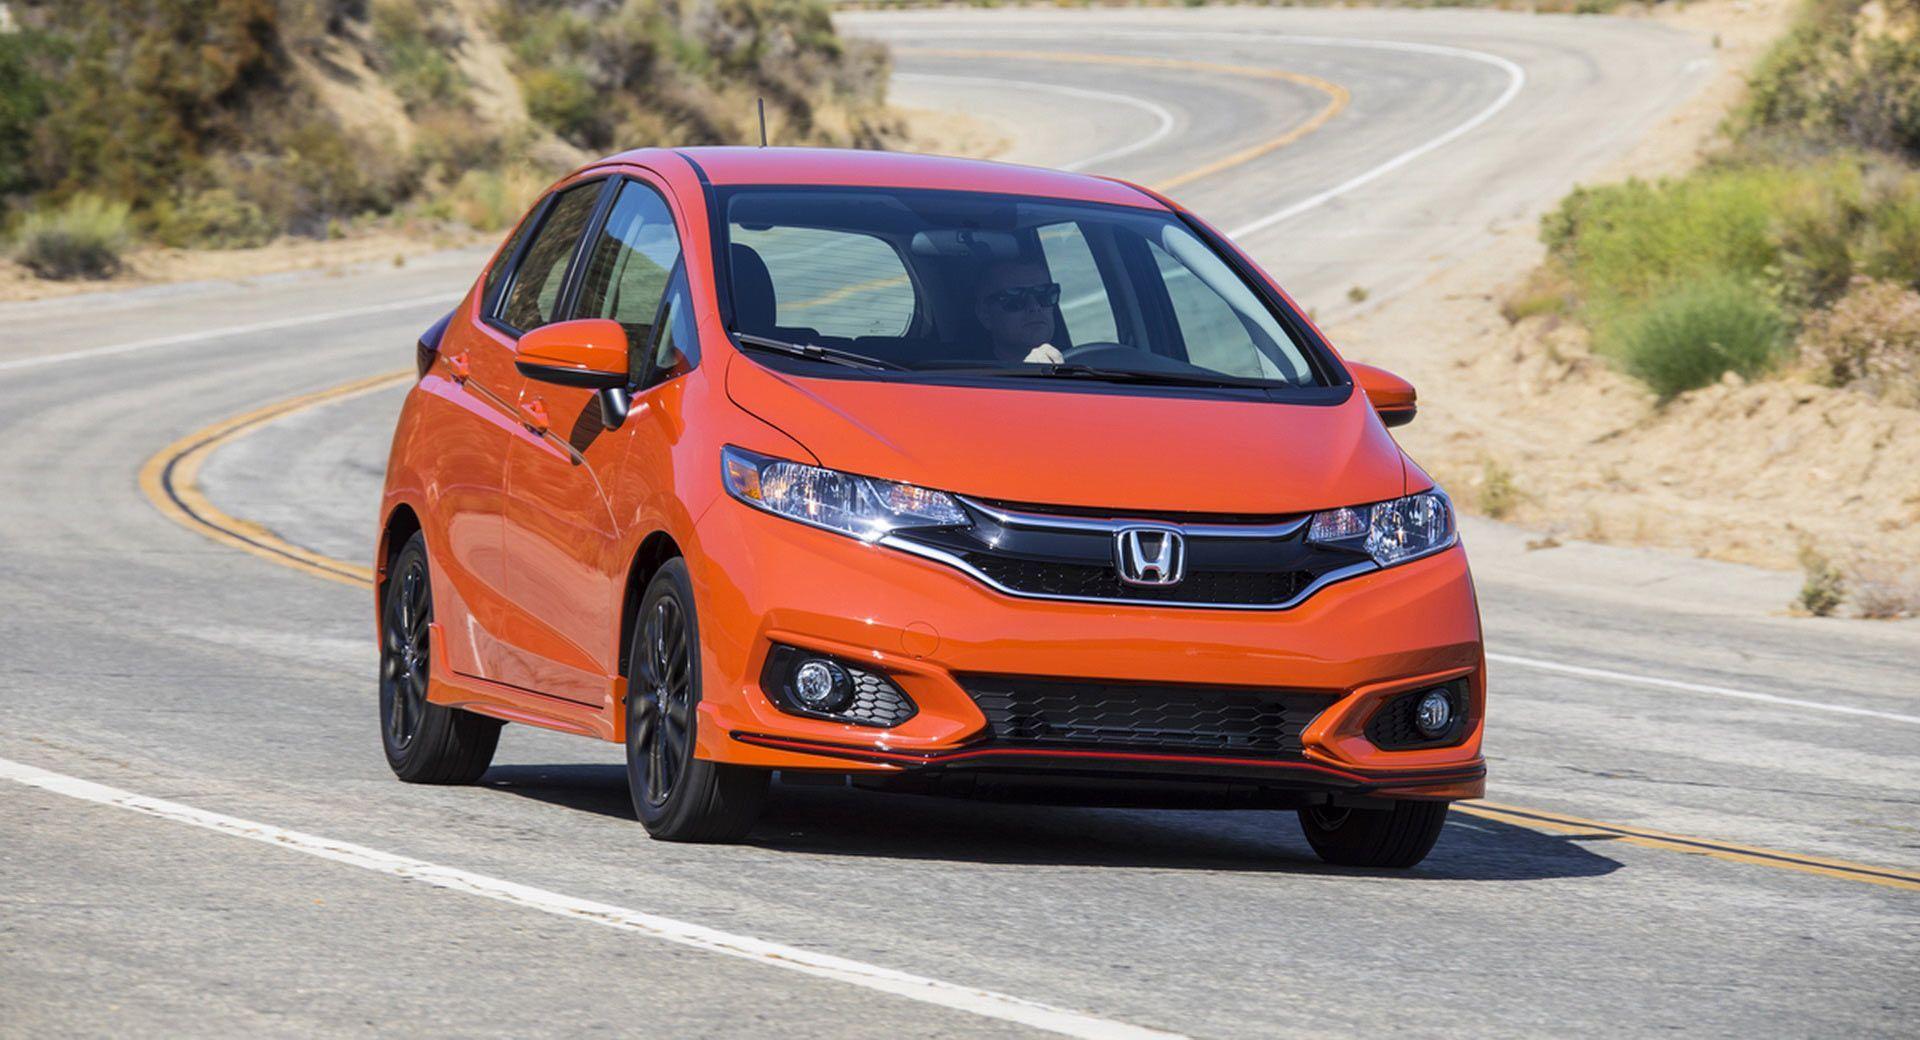 2019 Honda Fit Arrives In Dealer Lots Priced From $17 080 MSRP